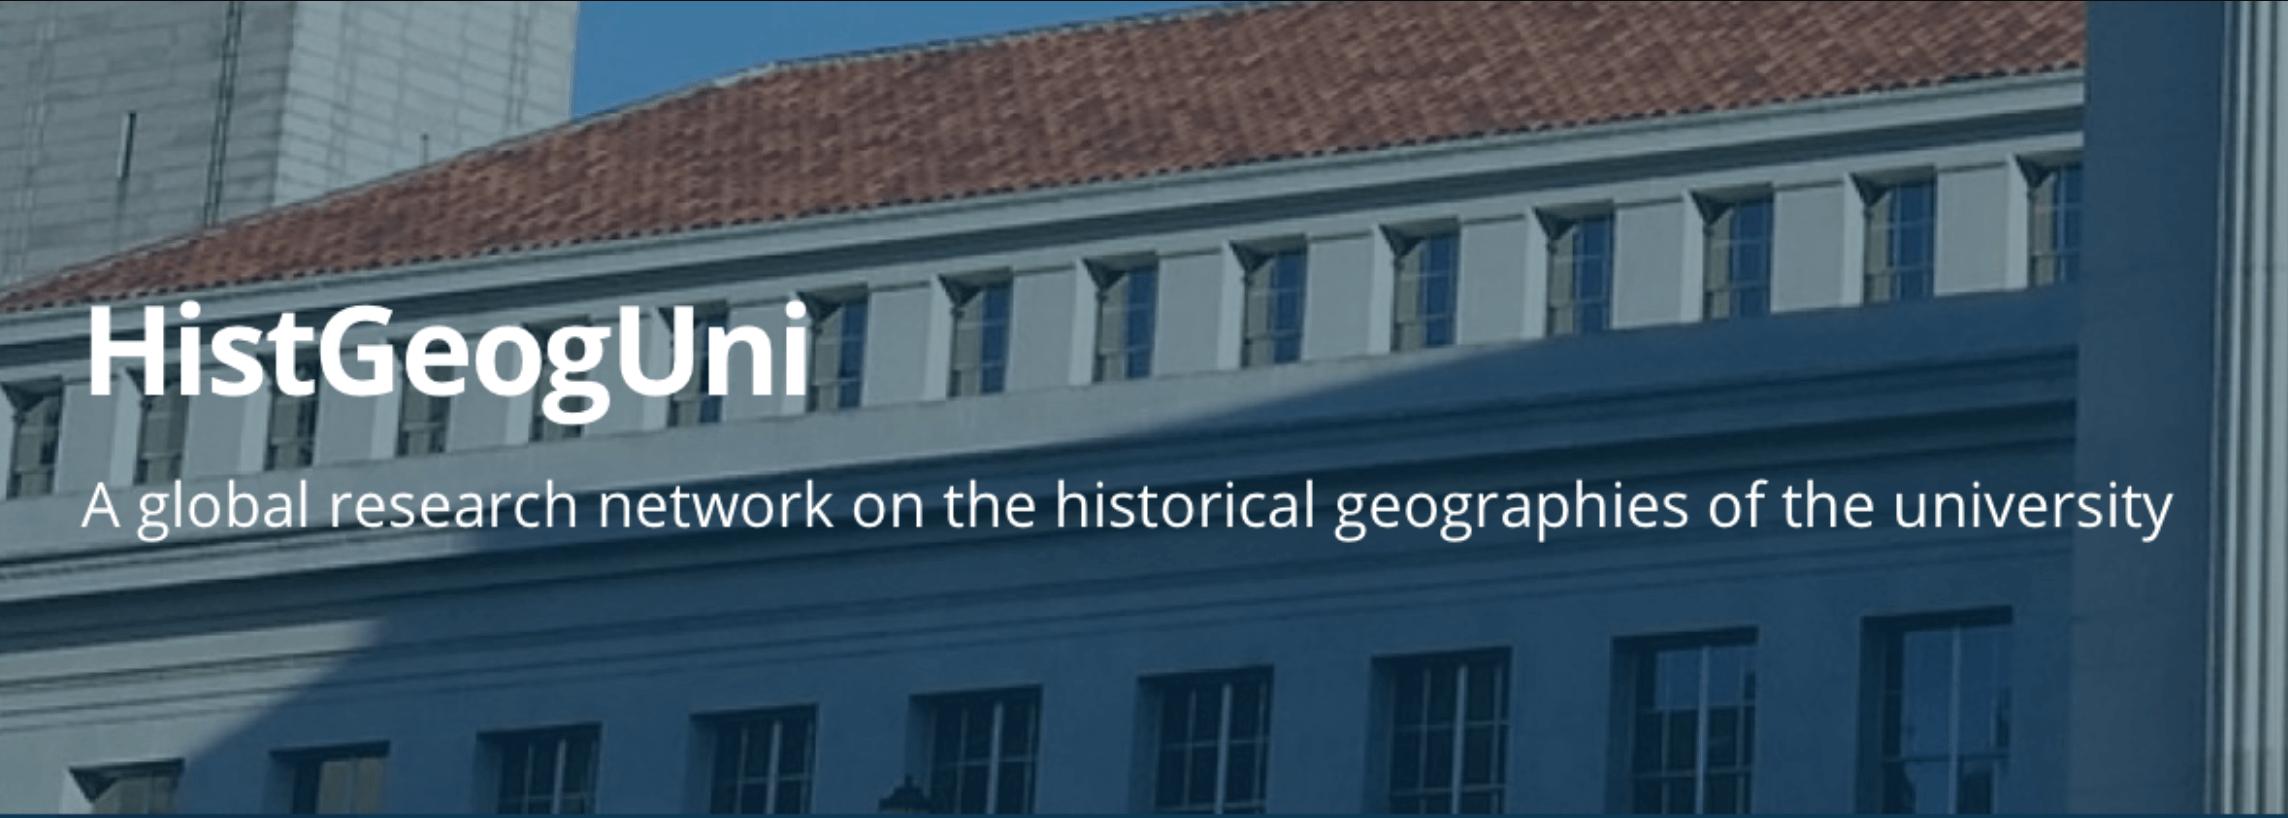 History of the University seminar